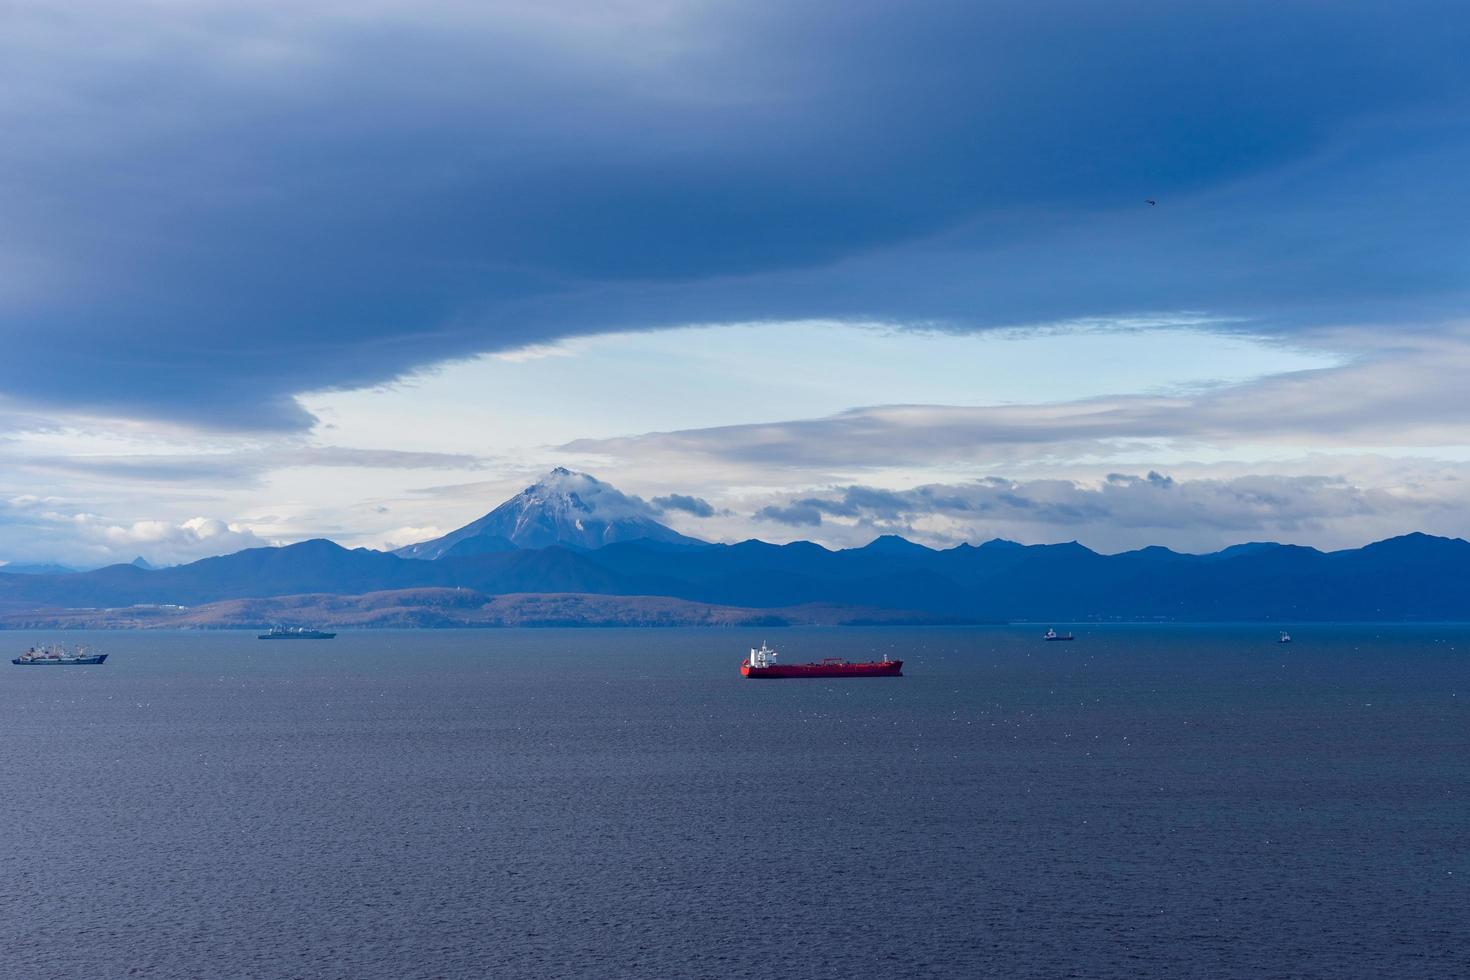 Meereslandschaft mit Blick auf die Avacha-Bucht. petropavlovsk-kamchatsky, russland foto